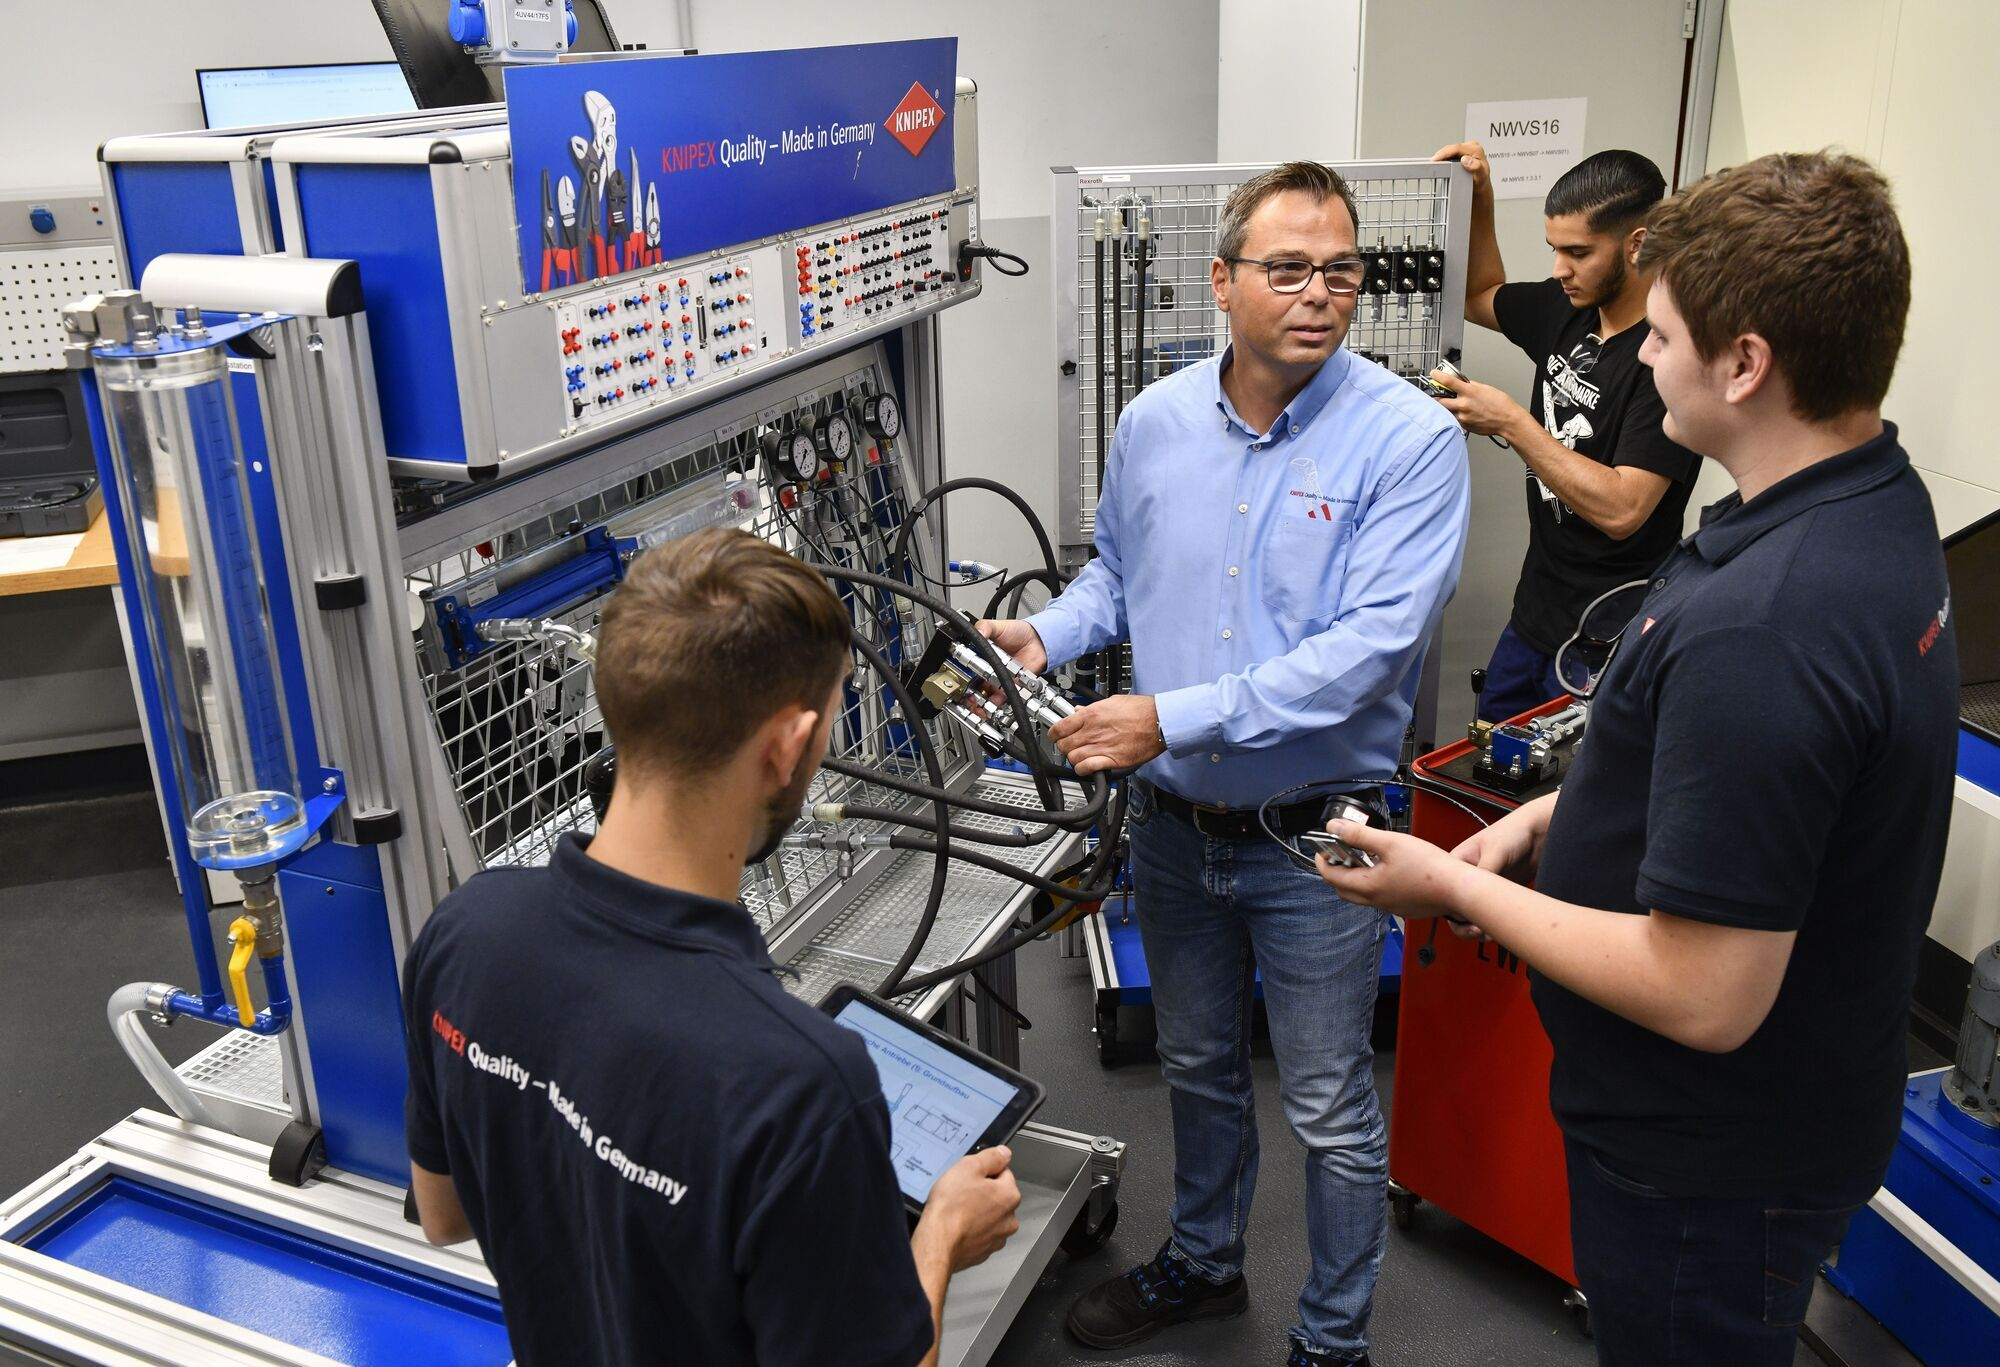 Industriemechaniker Ausbildungsvergütung